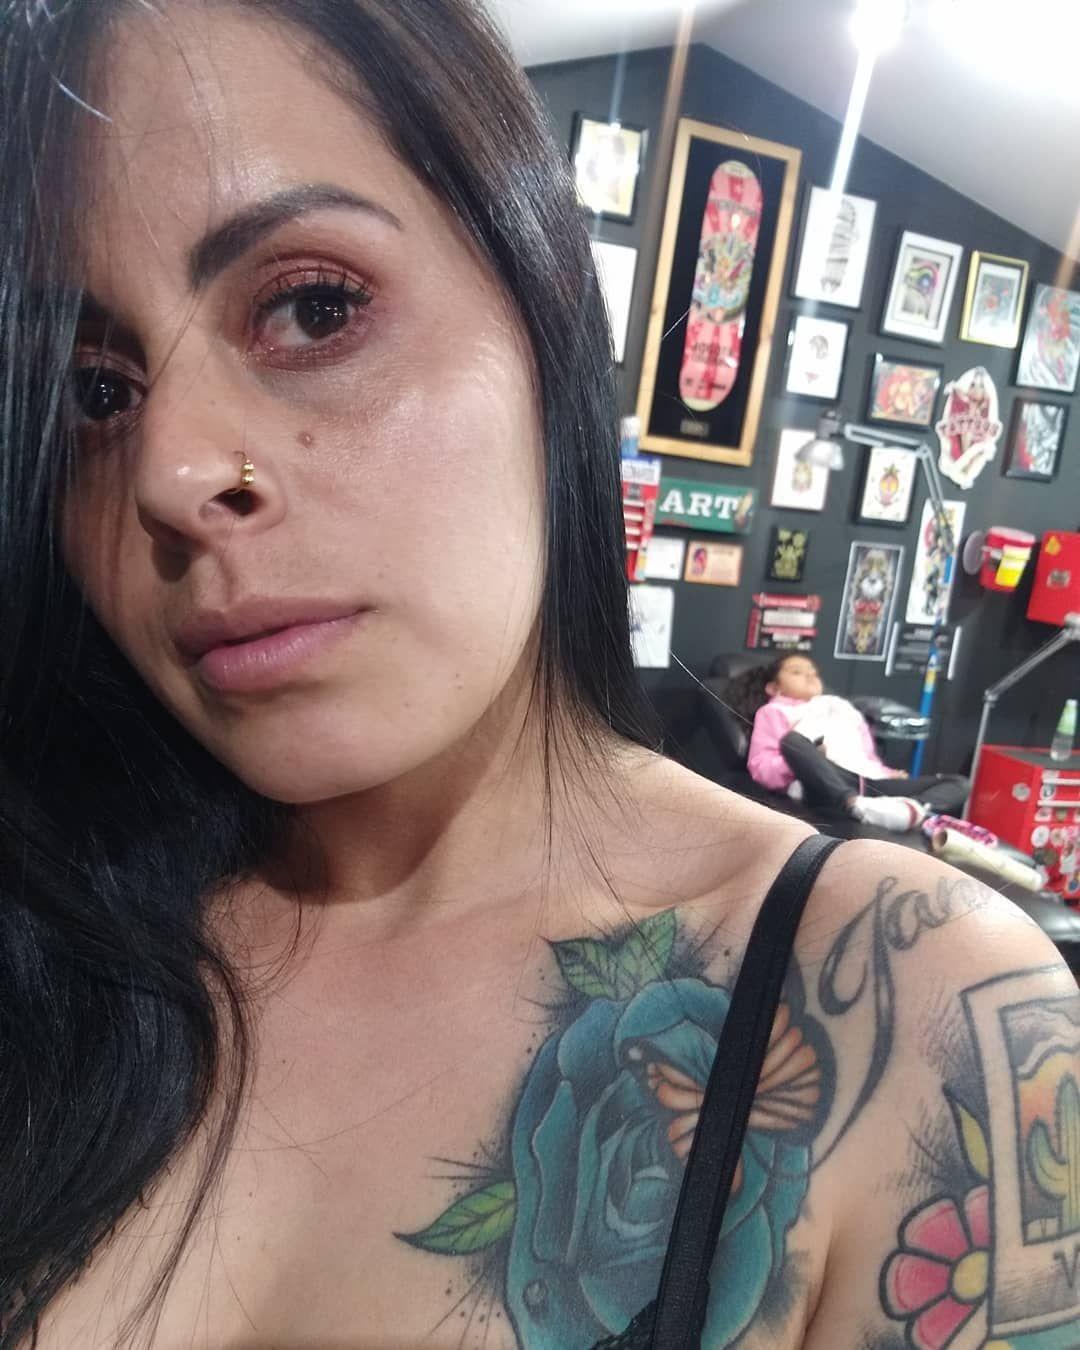 Hay una prolongación de mi corazón por ahí. 🍓🍓🍓🍓🍓🍓 #mom #live #love #neotradicionaltattoo #city #mommy #son #family #tattoo #tatuajes #tattooart #tattooartist #ink  #art #eye #freestyle #free #love #colombia #mexico #me #amor #bogota #neotradicionaltattoo  #inked #womenstyle #style